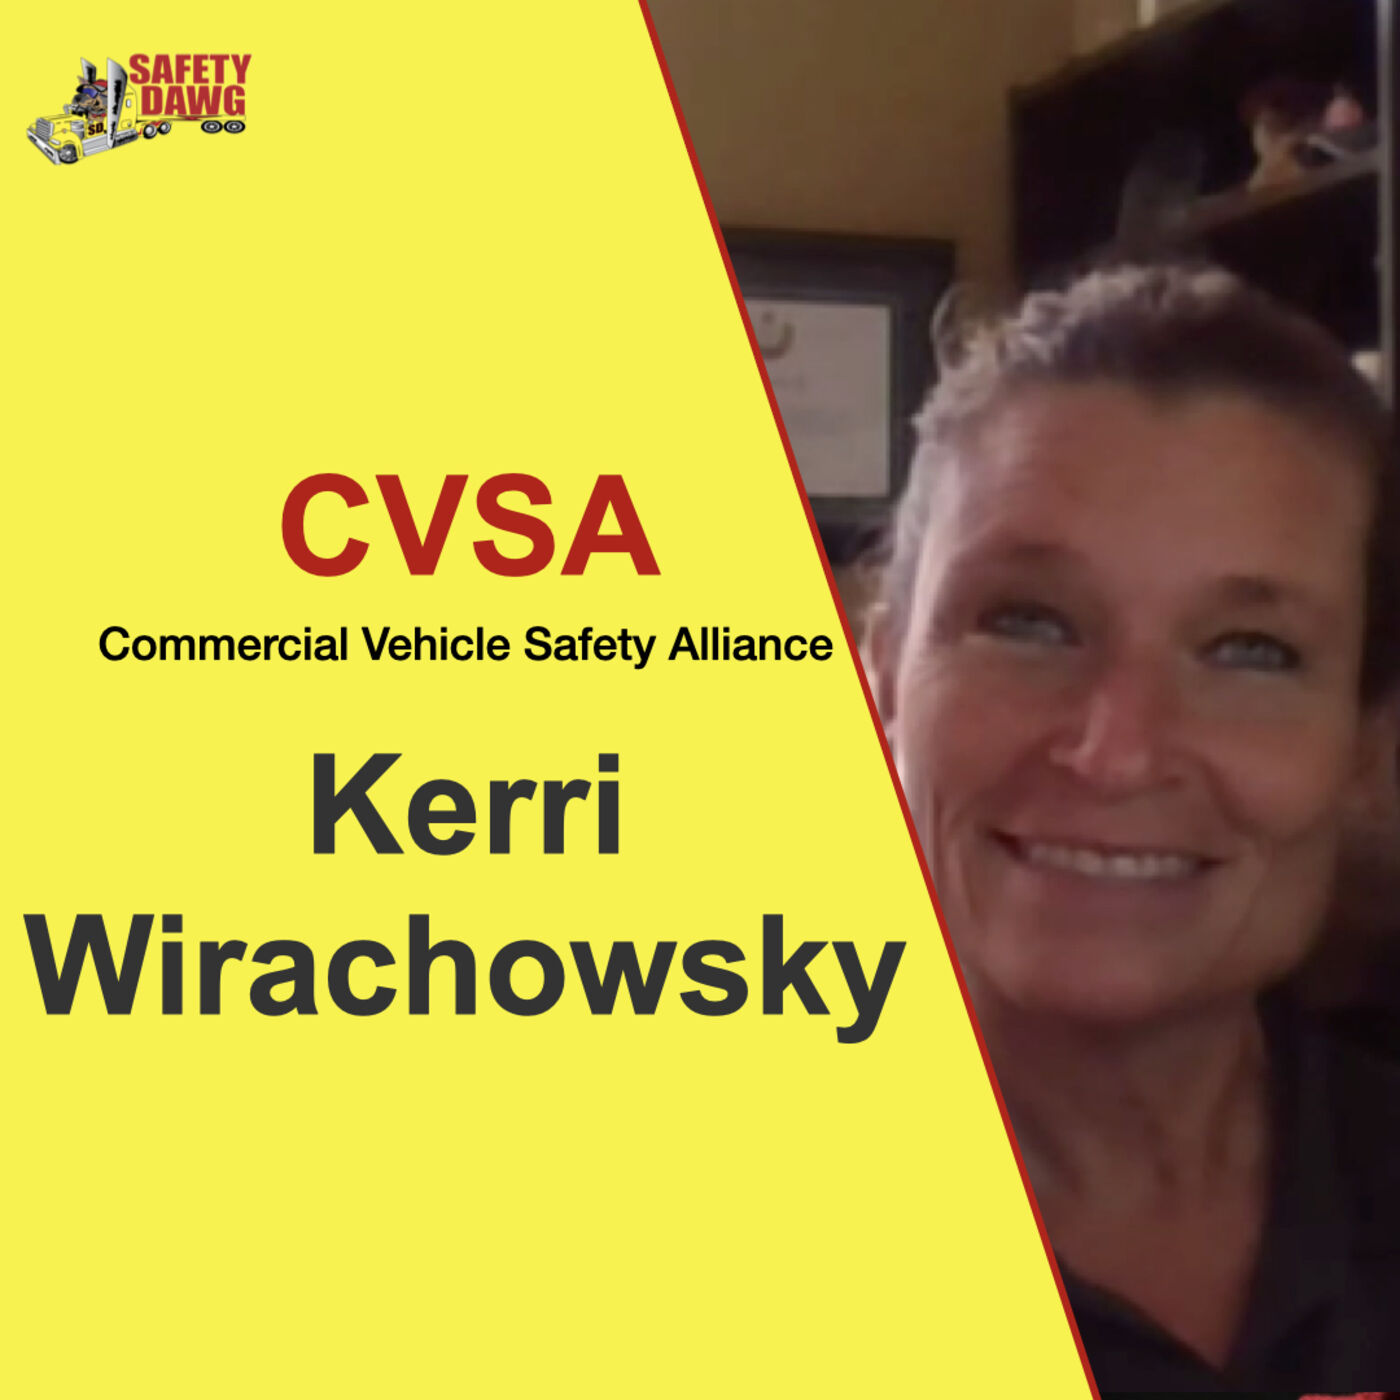 Kerri Wirachowsky of CVSA, Talks Truck Inspections Including Autonomous Vehicles